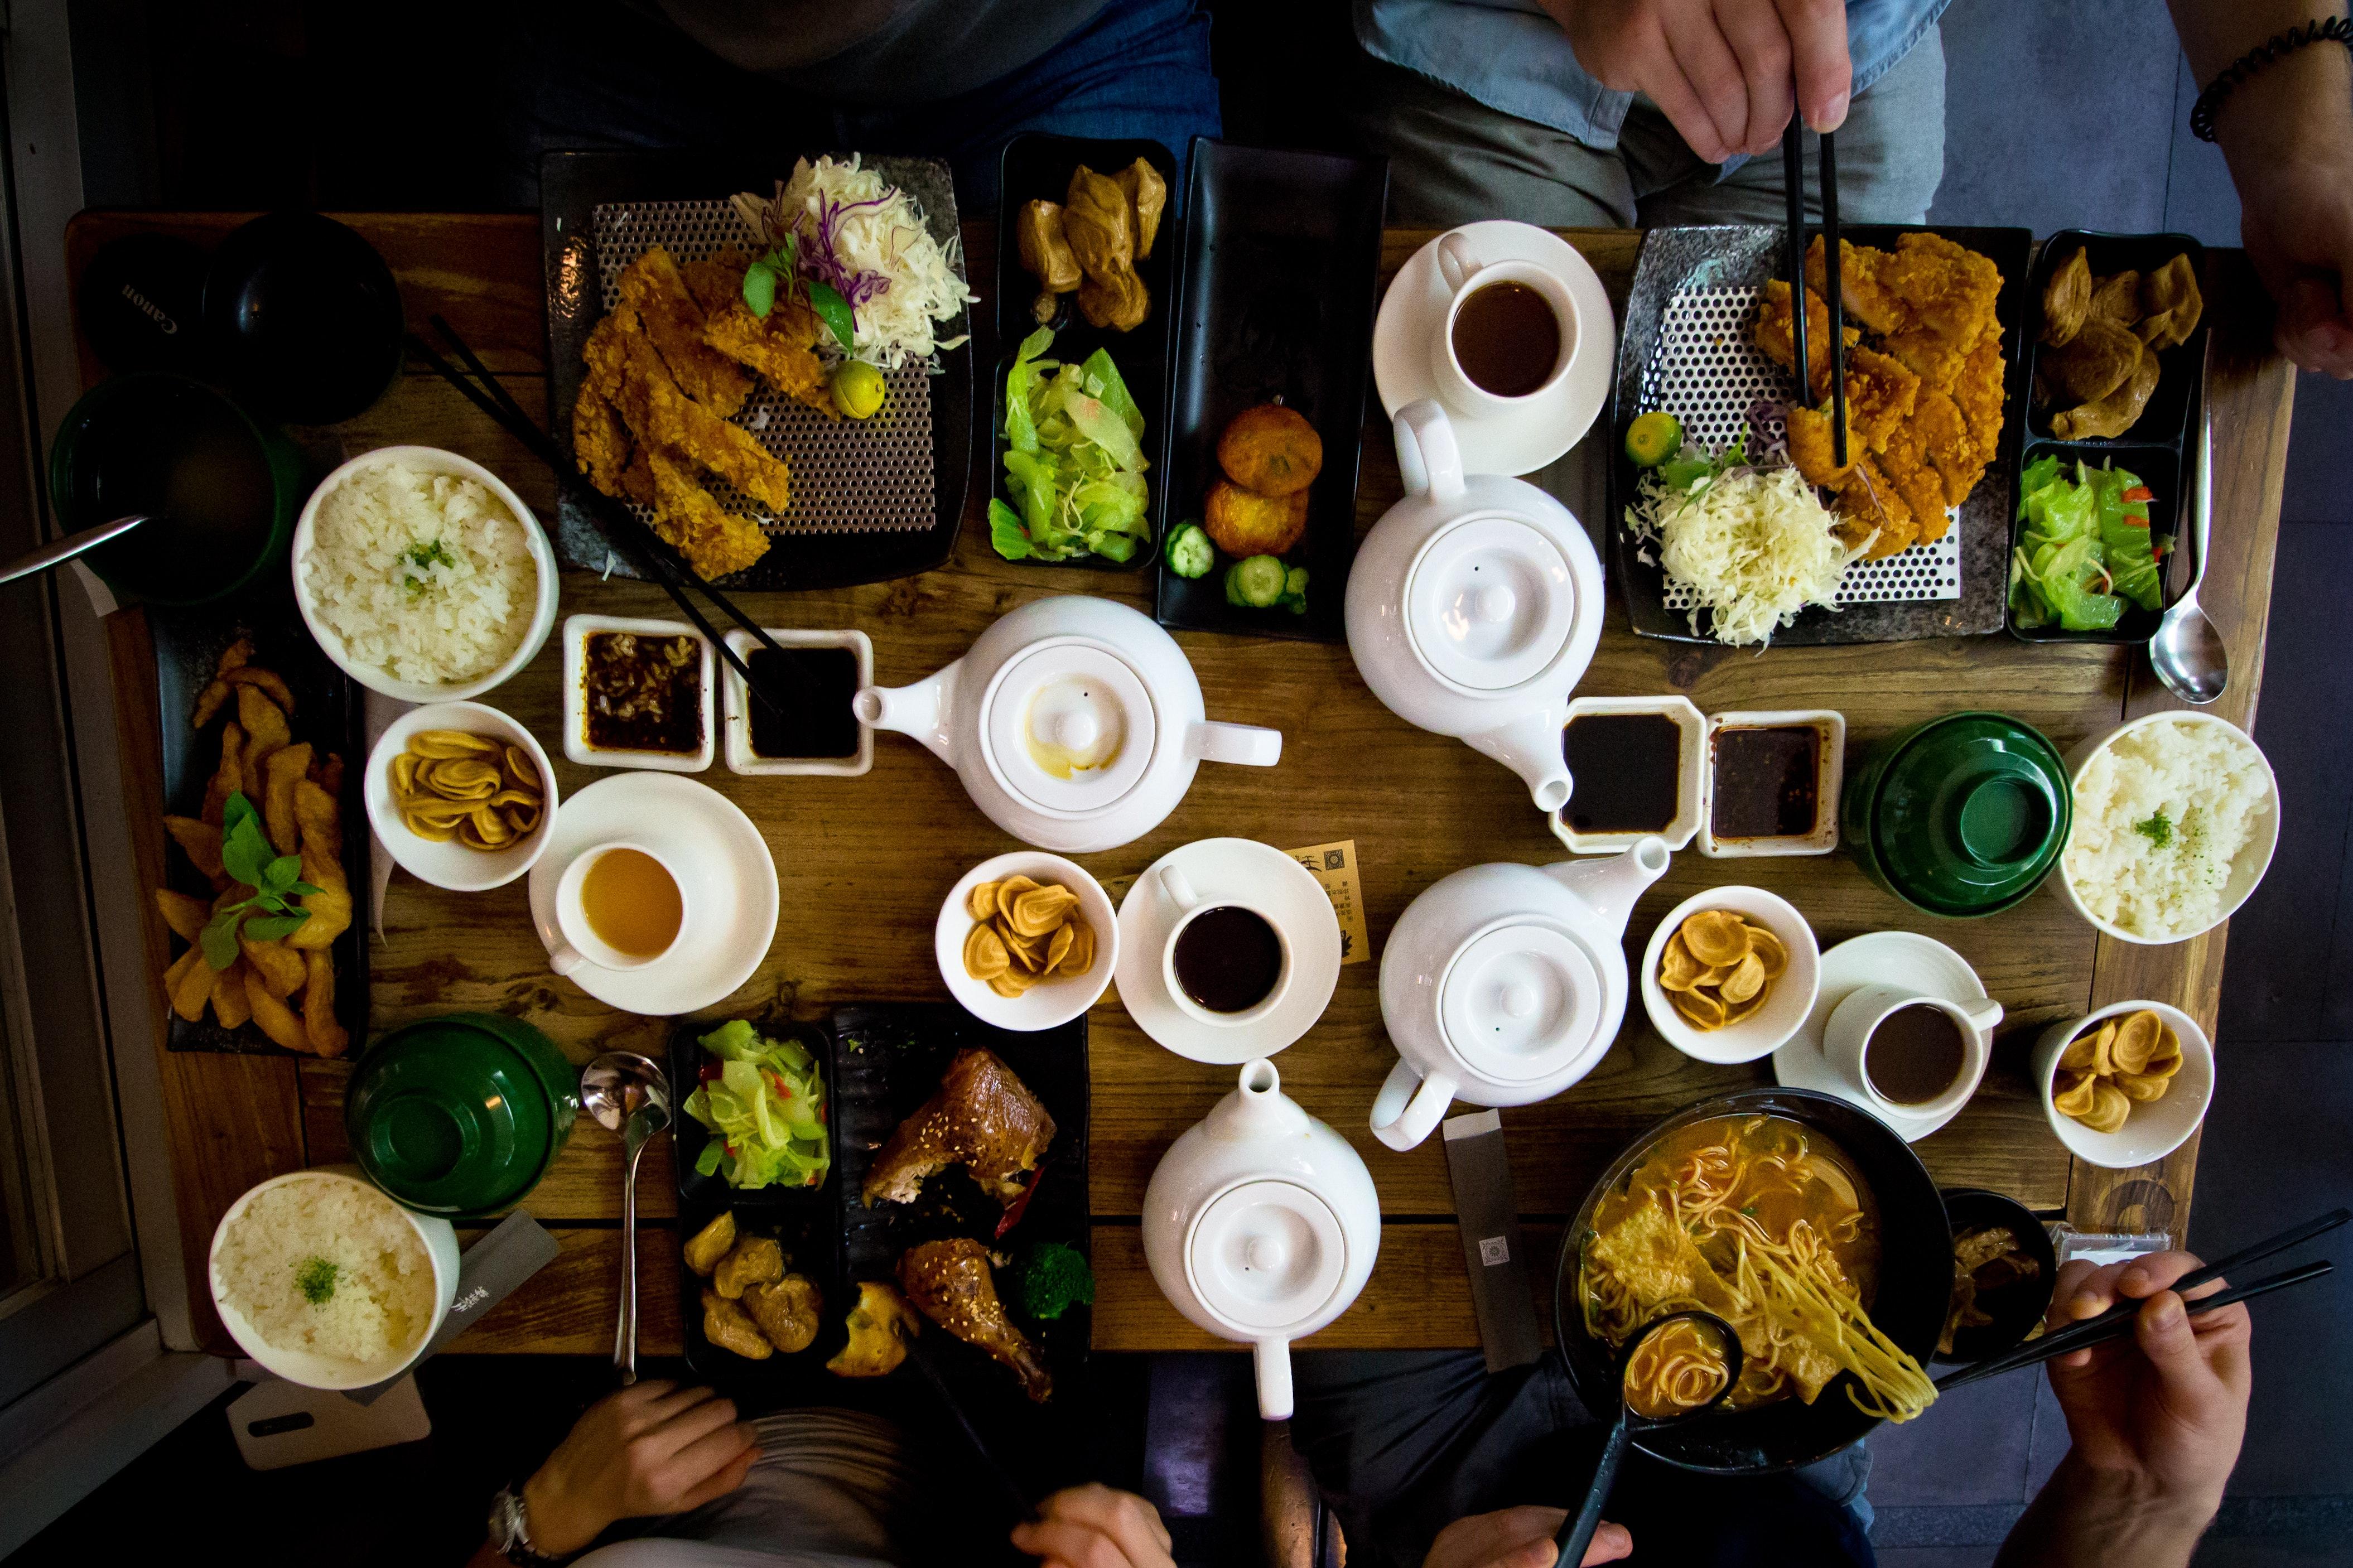 adult asian food celebration 1310777